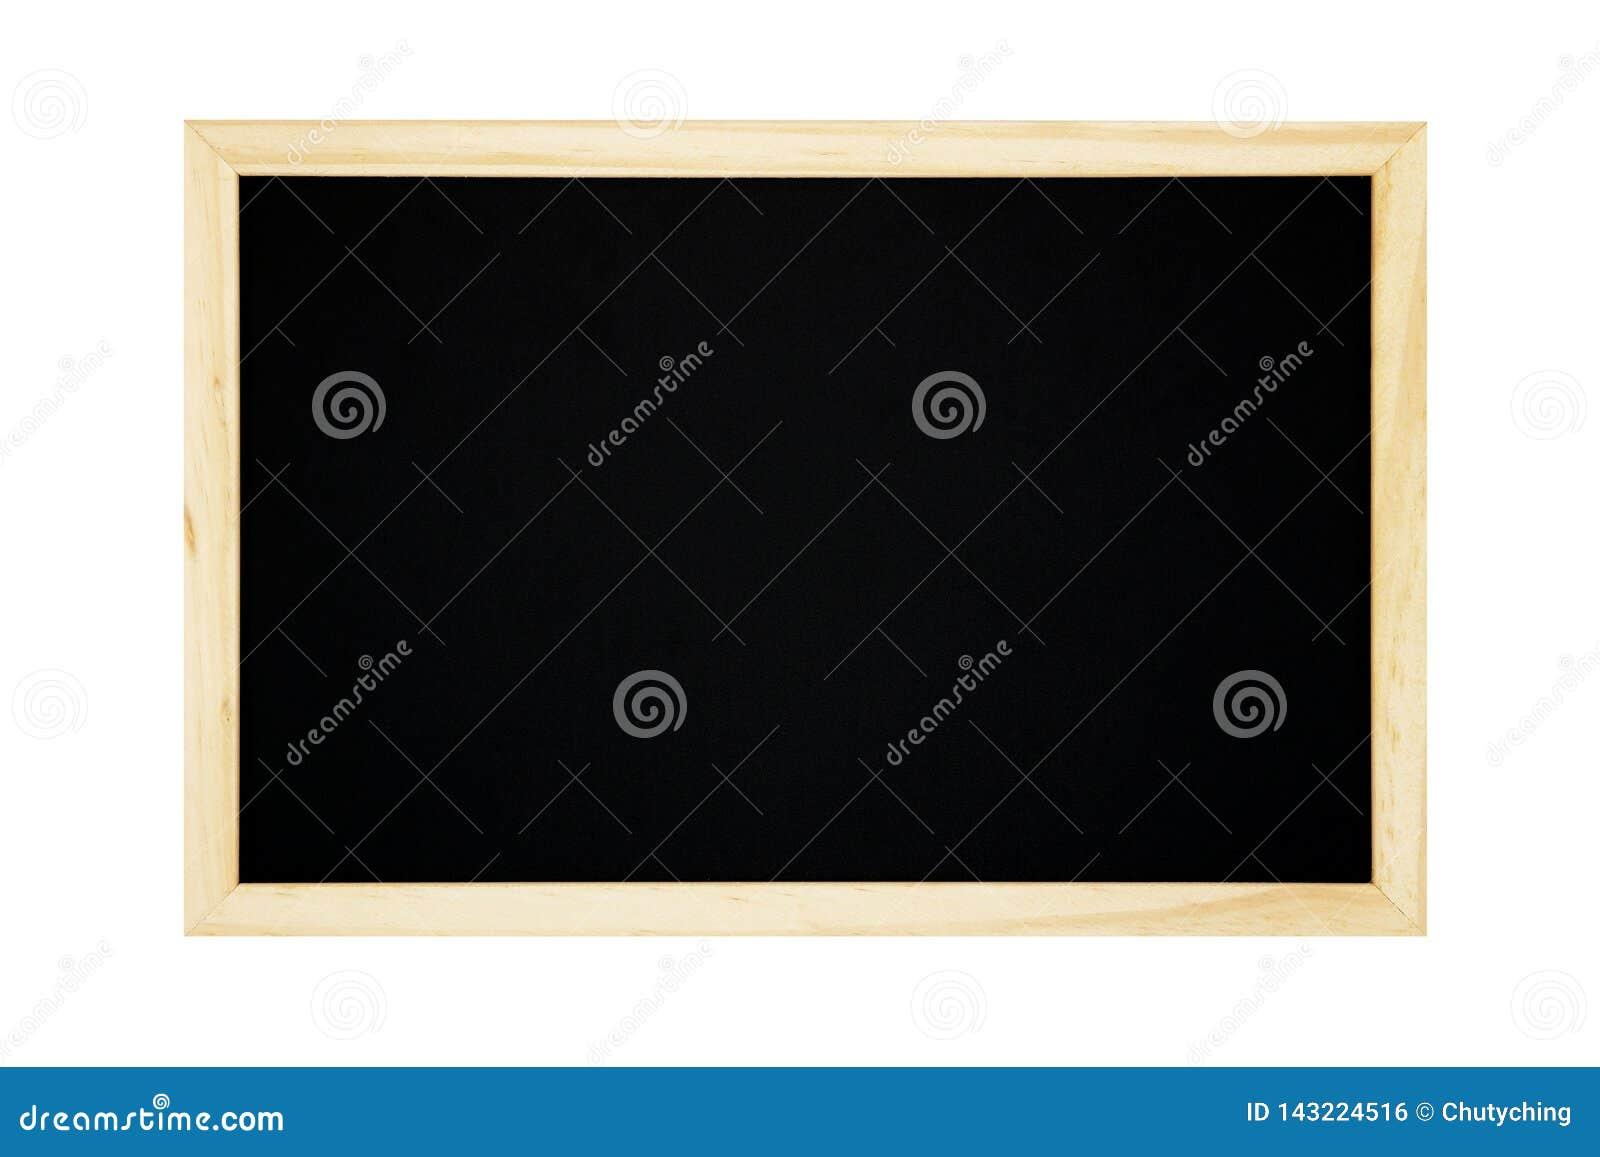 Blank chalkboard isolated on white background.